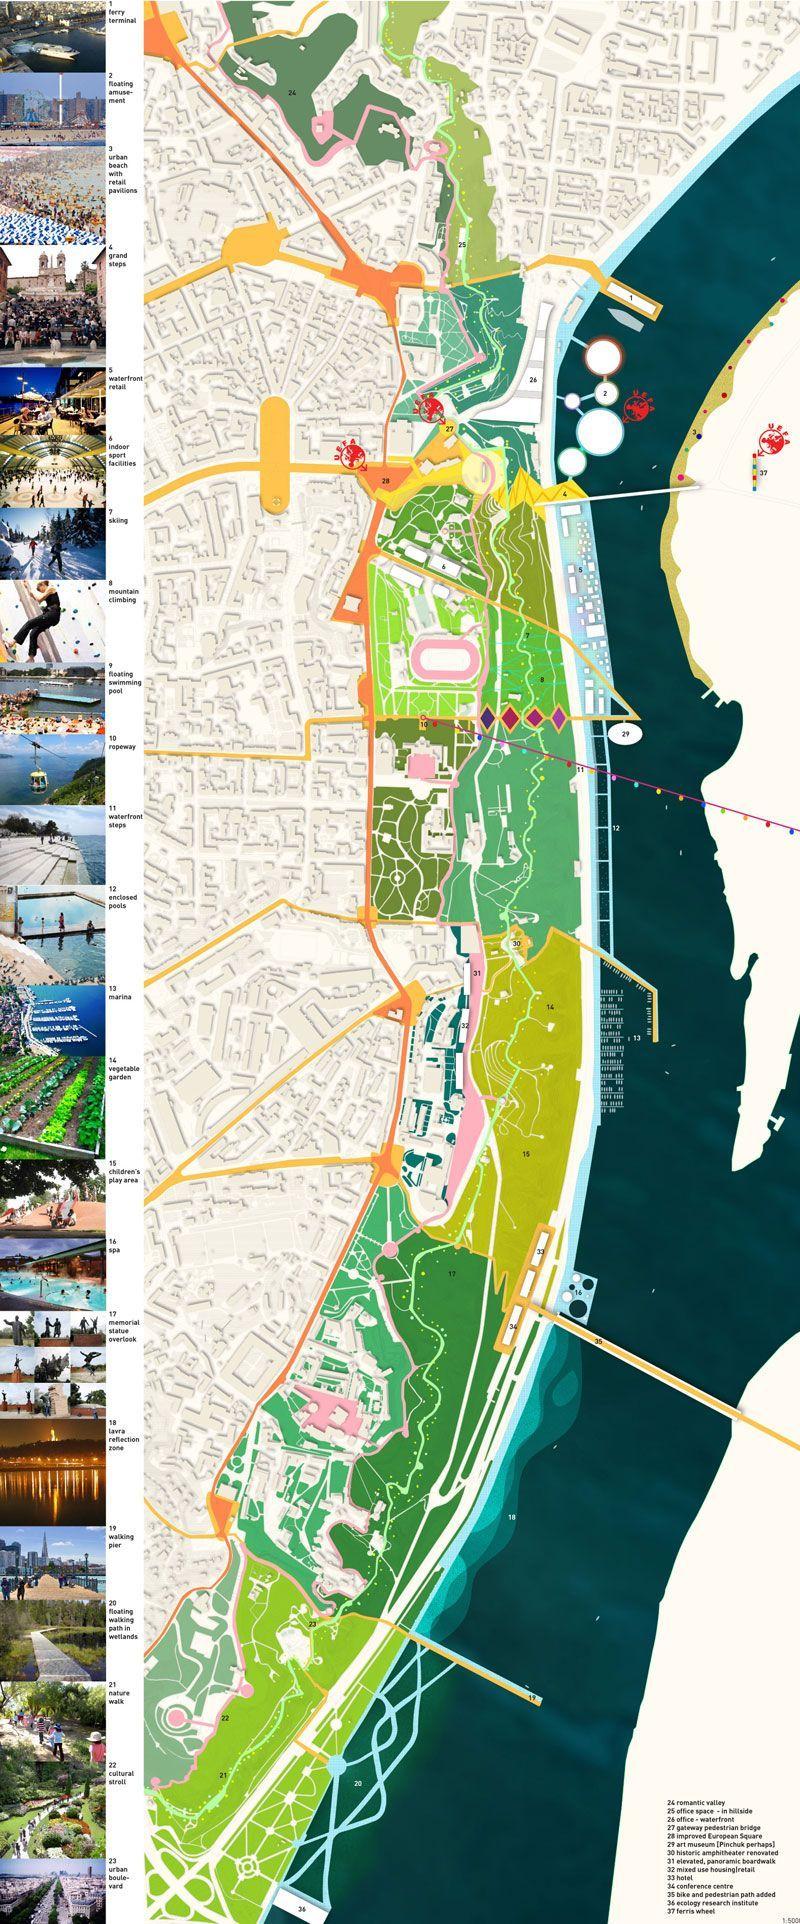 Using photos to illustrate urban activiites. Urban design